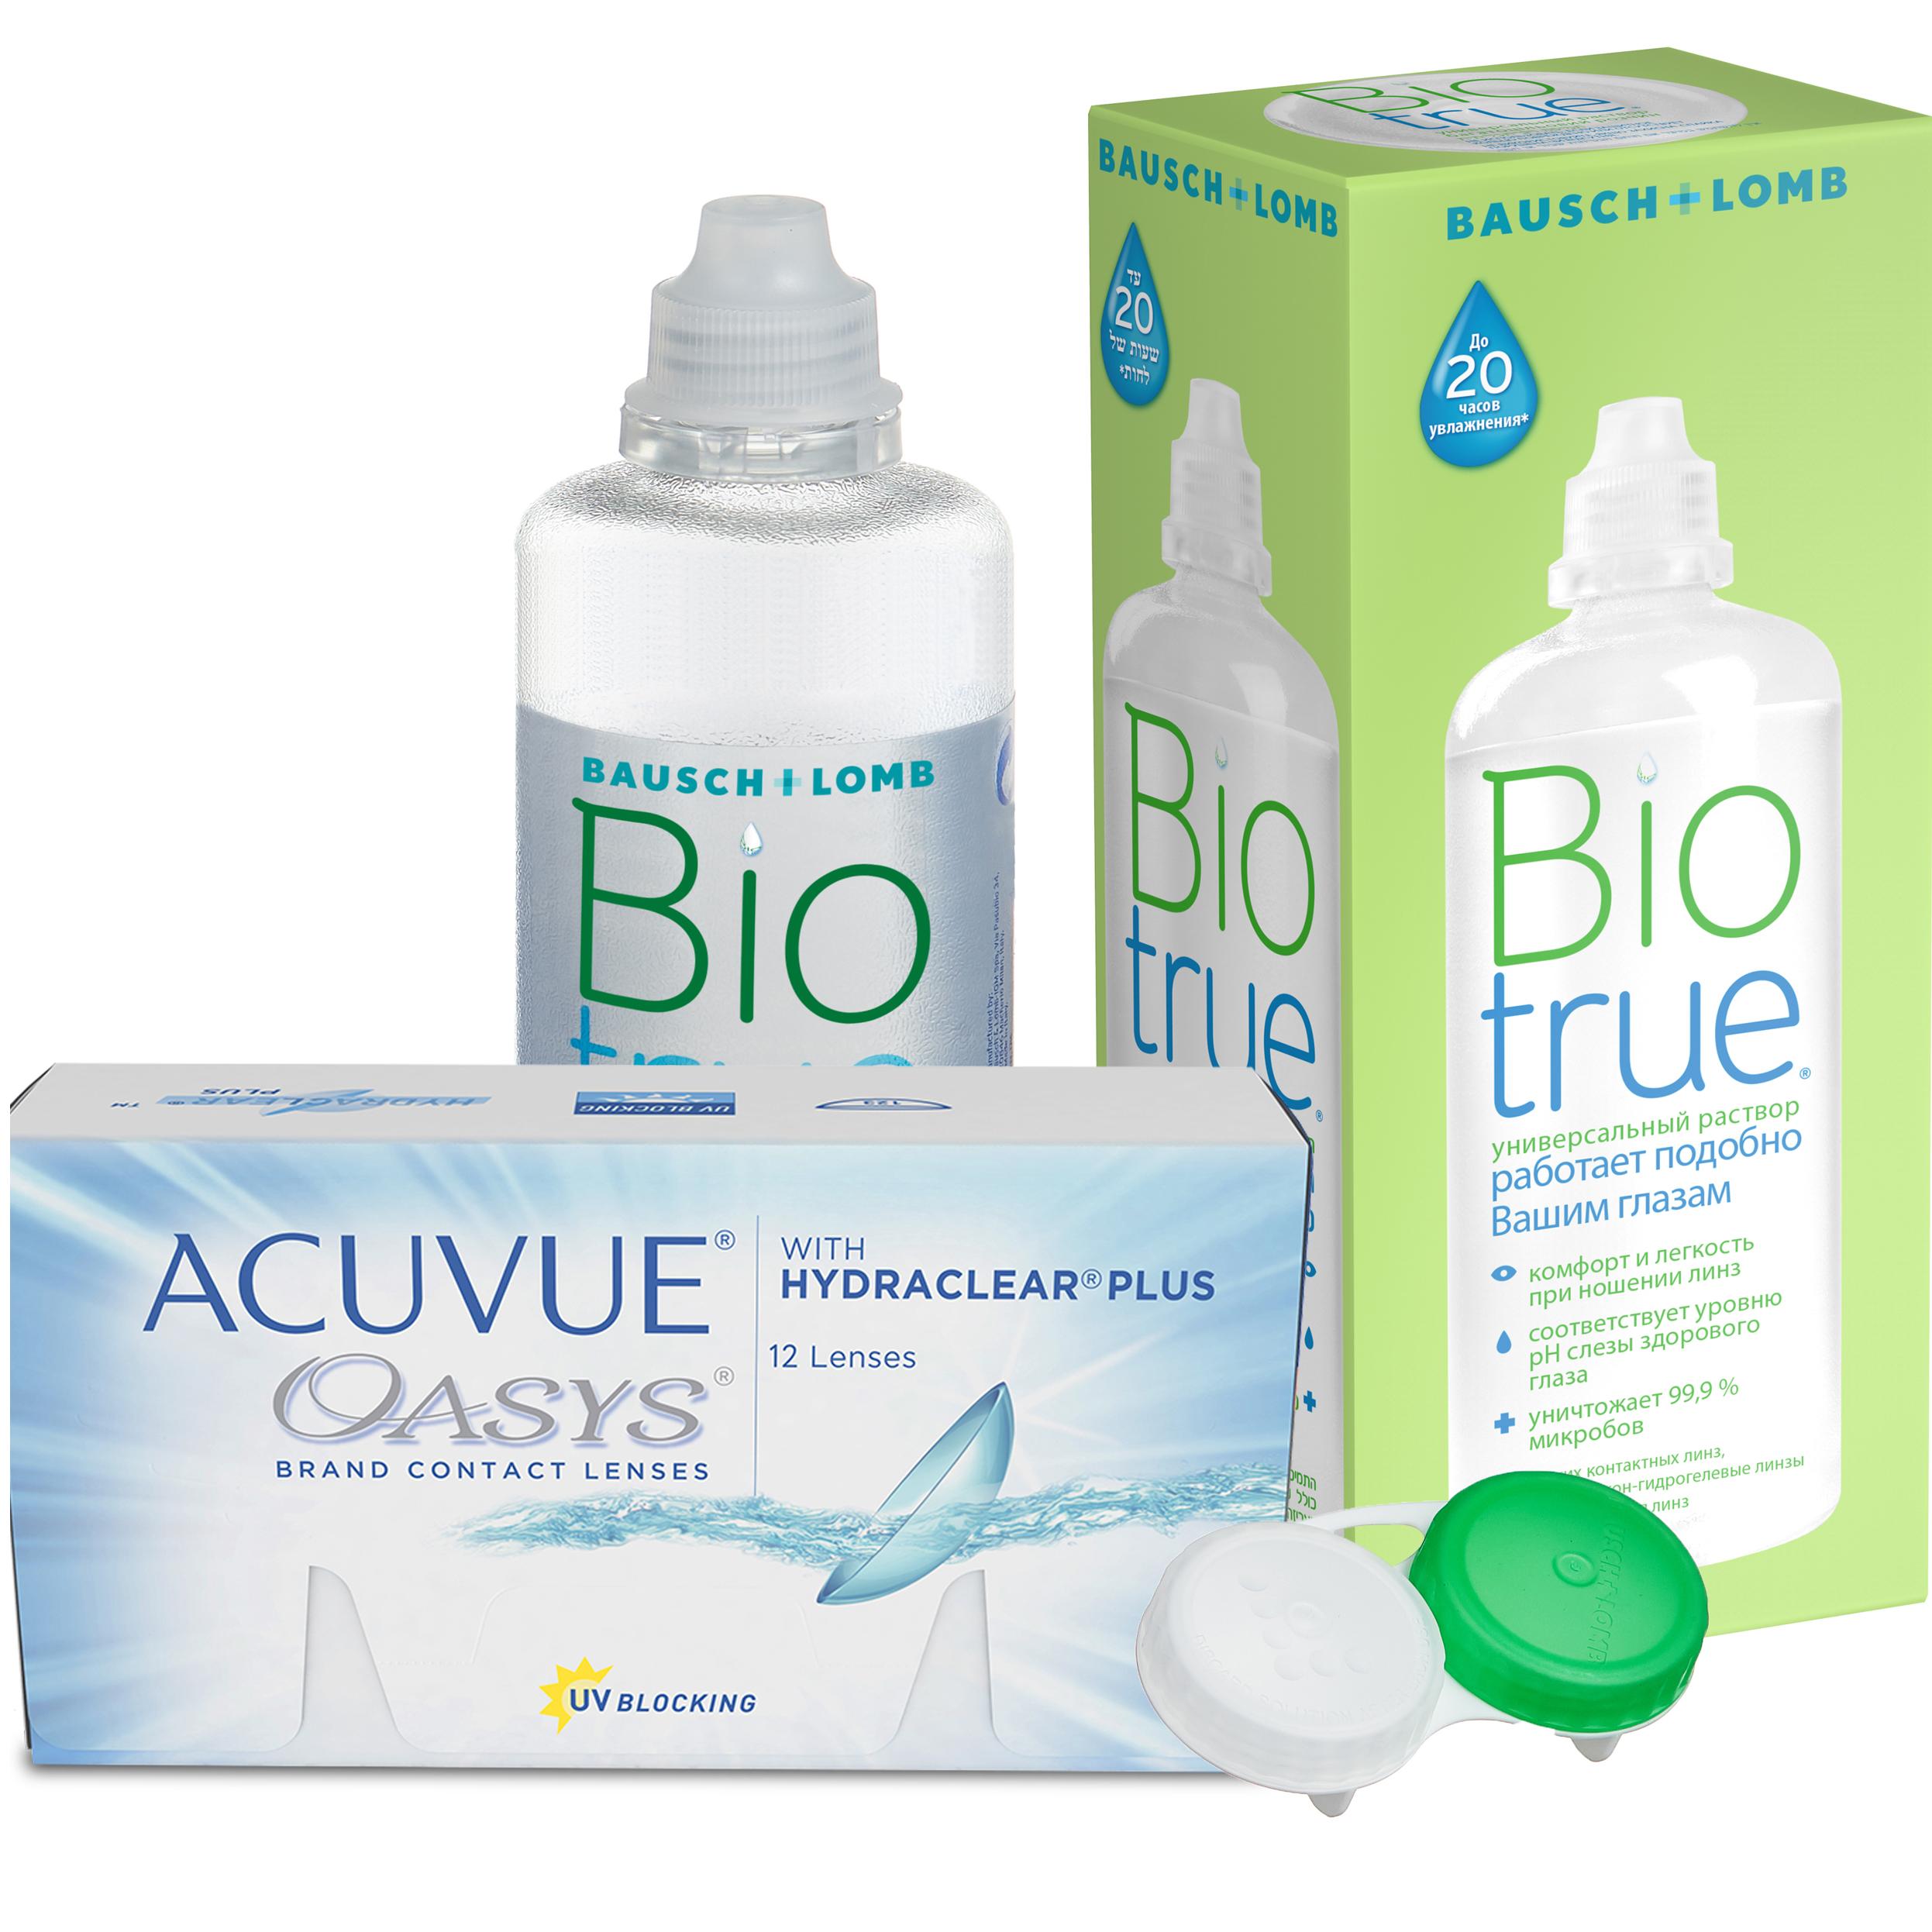 Купить Oasys with Hydraclear Plus 12 линз + Biotrue, Контактные линзы Acuvue Oasys with Hydraclear Plus 12 линз R 8.8 +3, 75 + Biotrue 300 мл